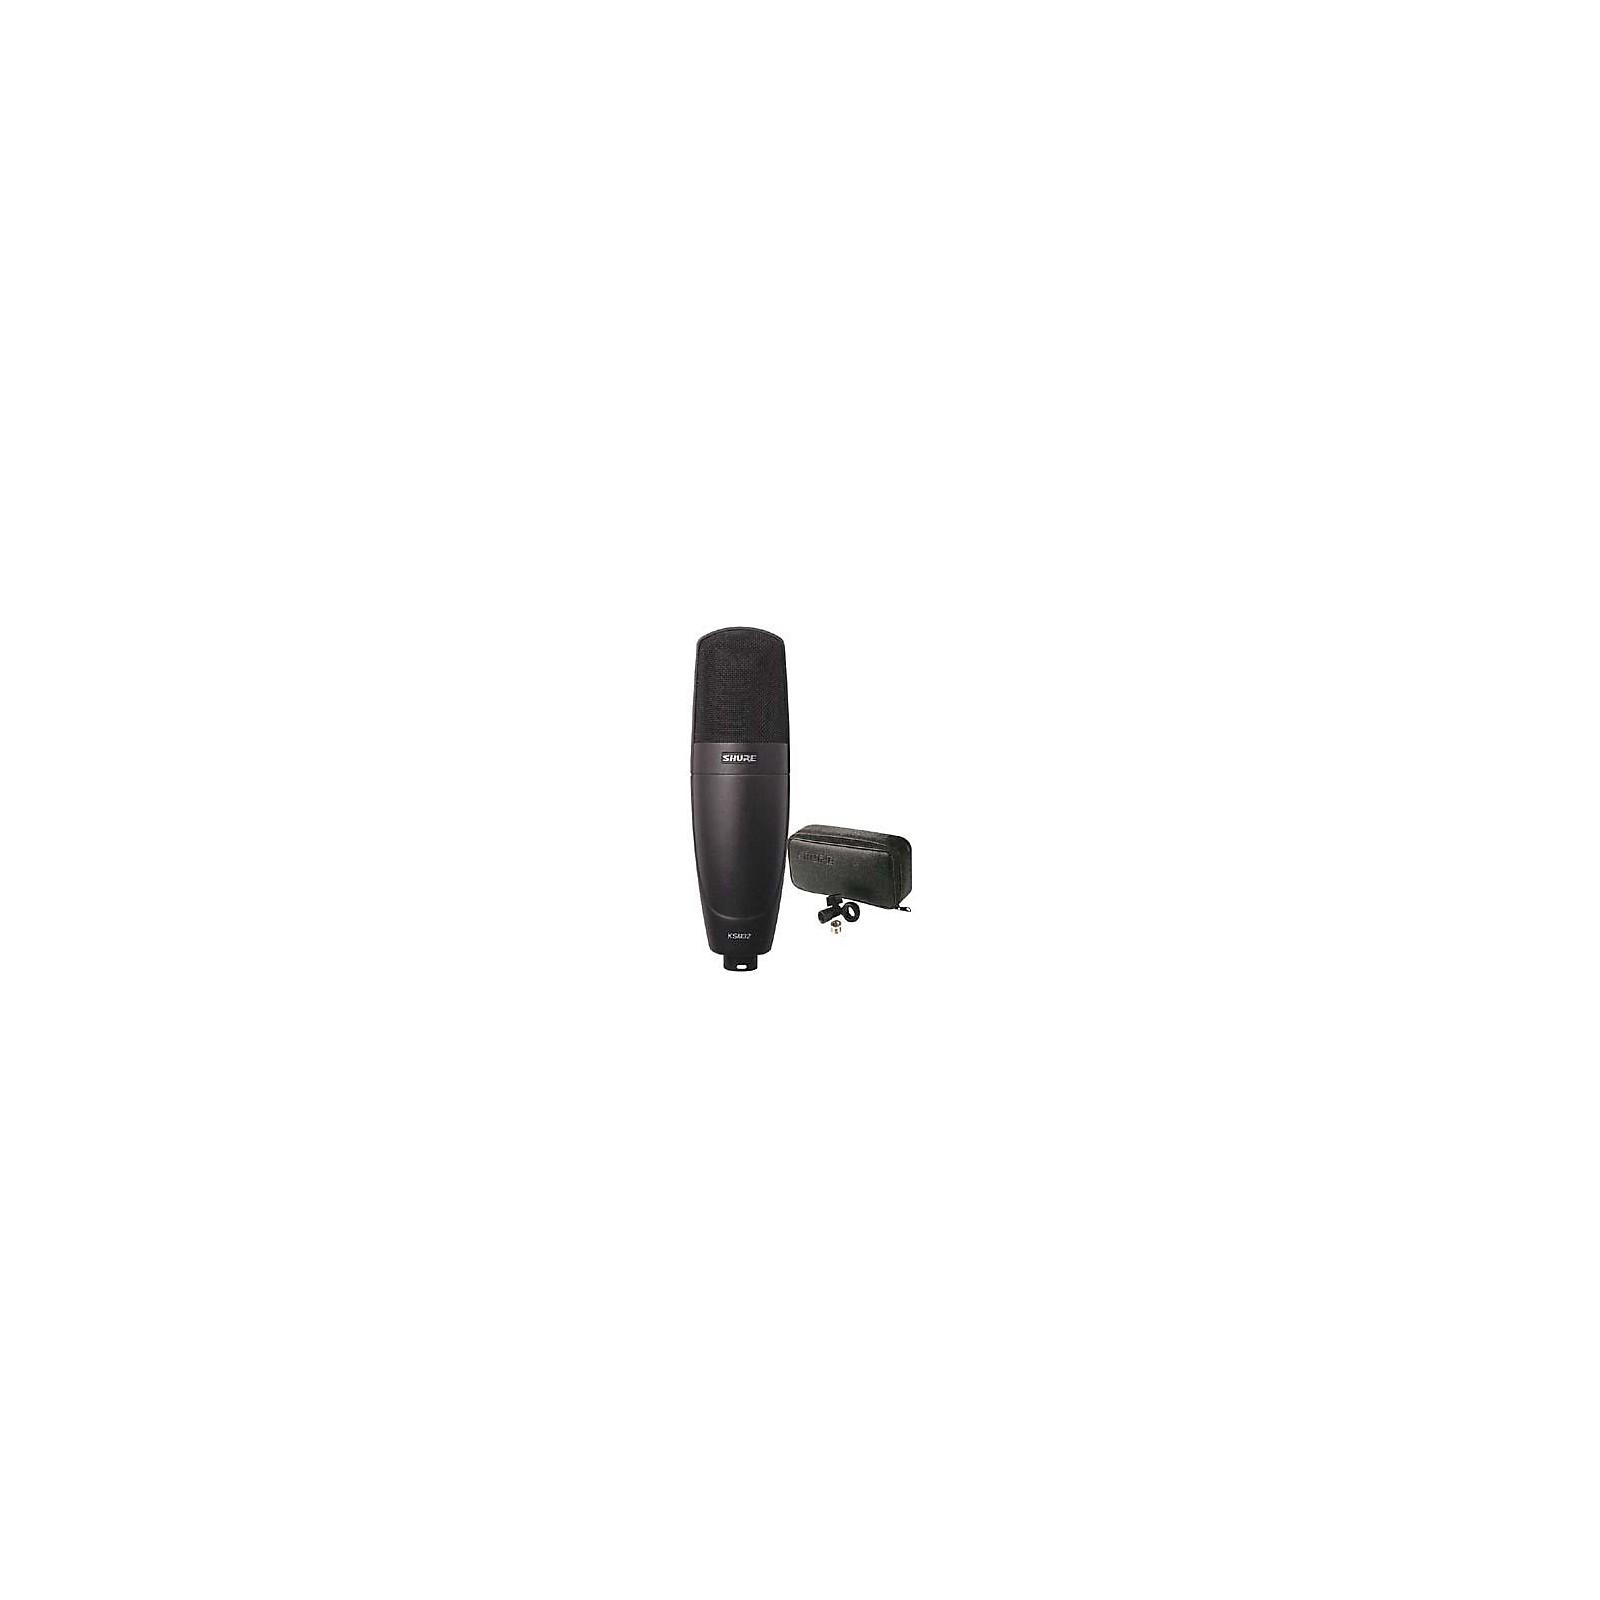 Open Box Shure KSM32/CG Condenser Microphone